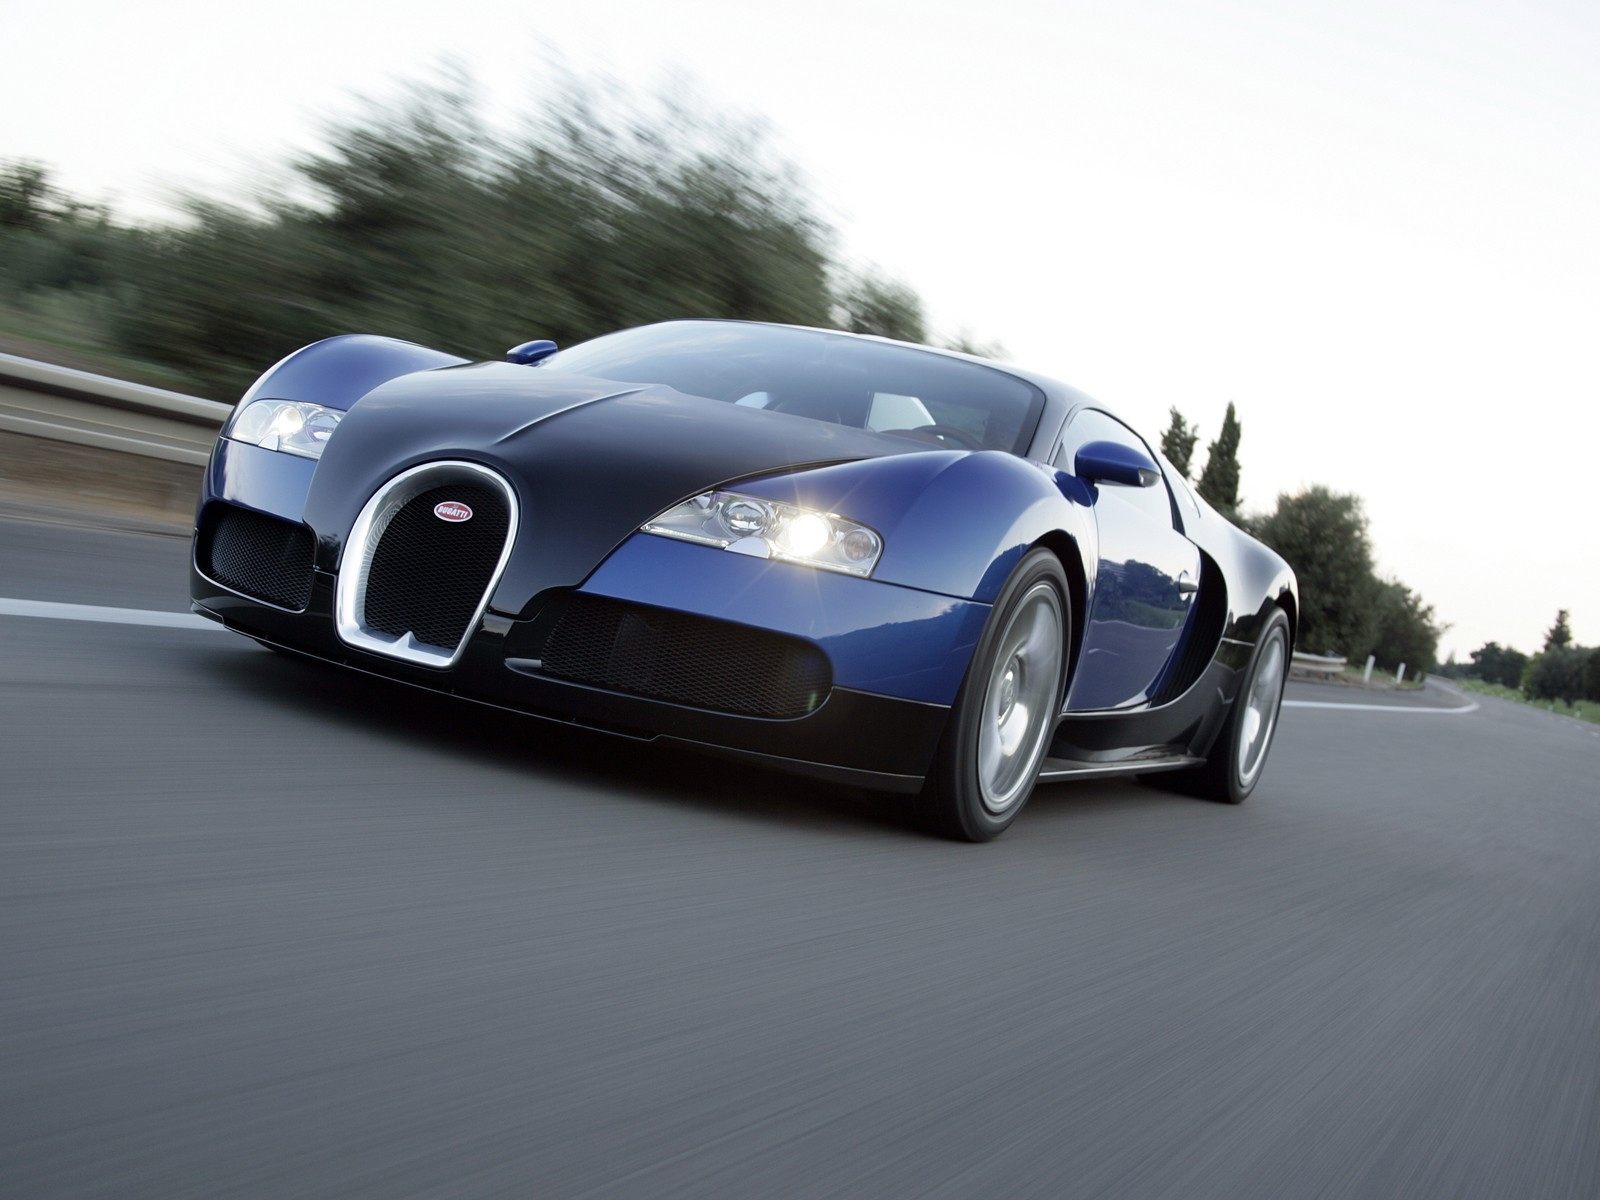 Bugatti Veyron Blue Grand Sport Wallpaper HD